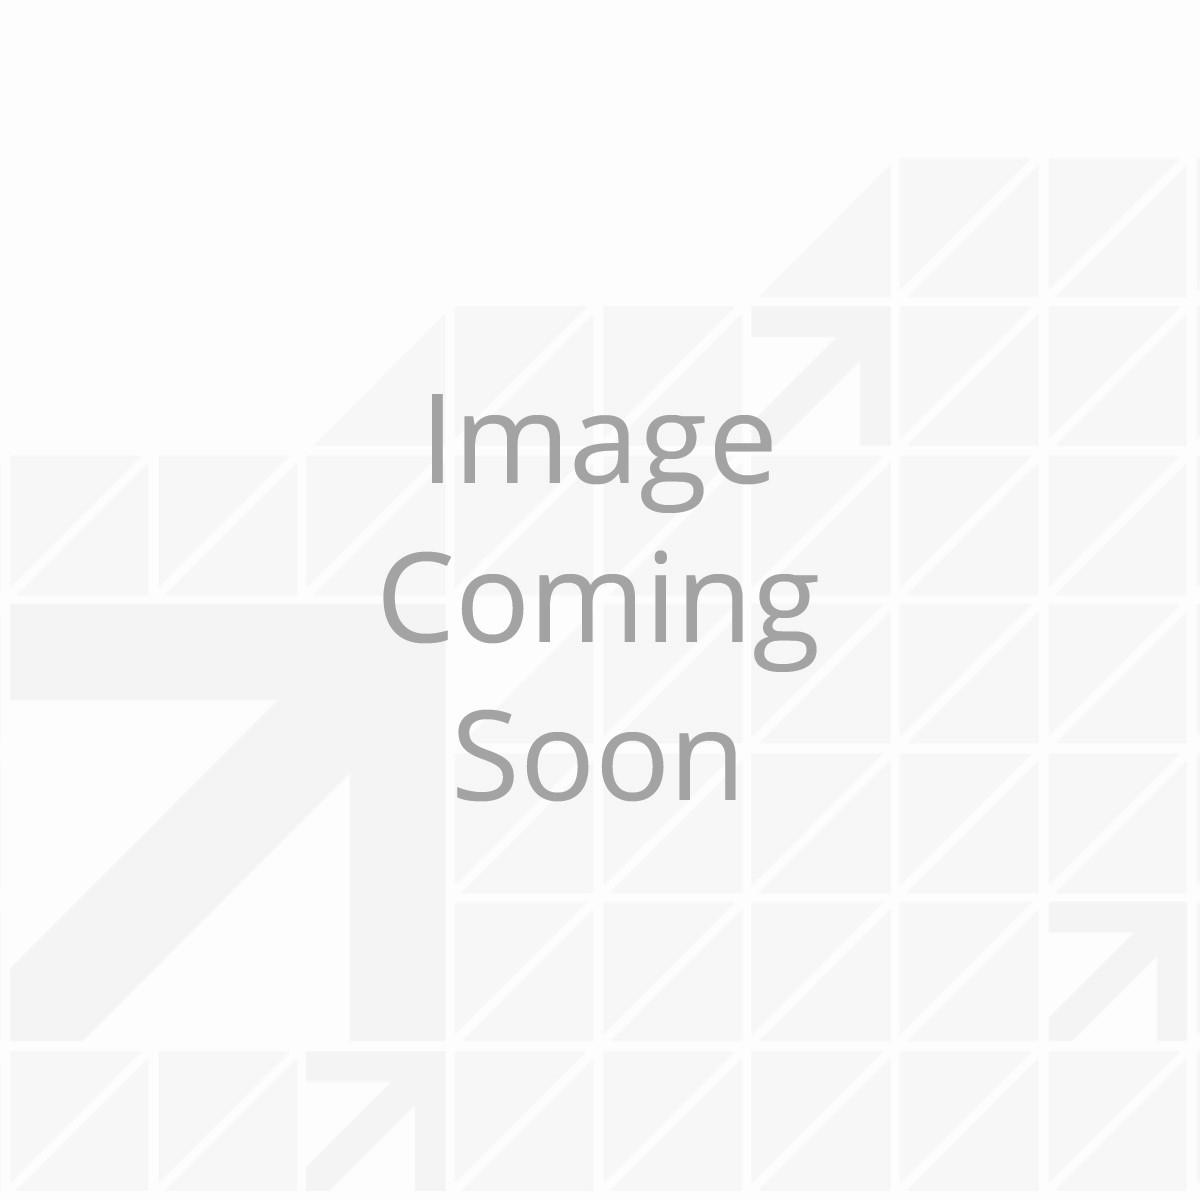 Heavy-Duty Shock Mount Kit - Various Sizes